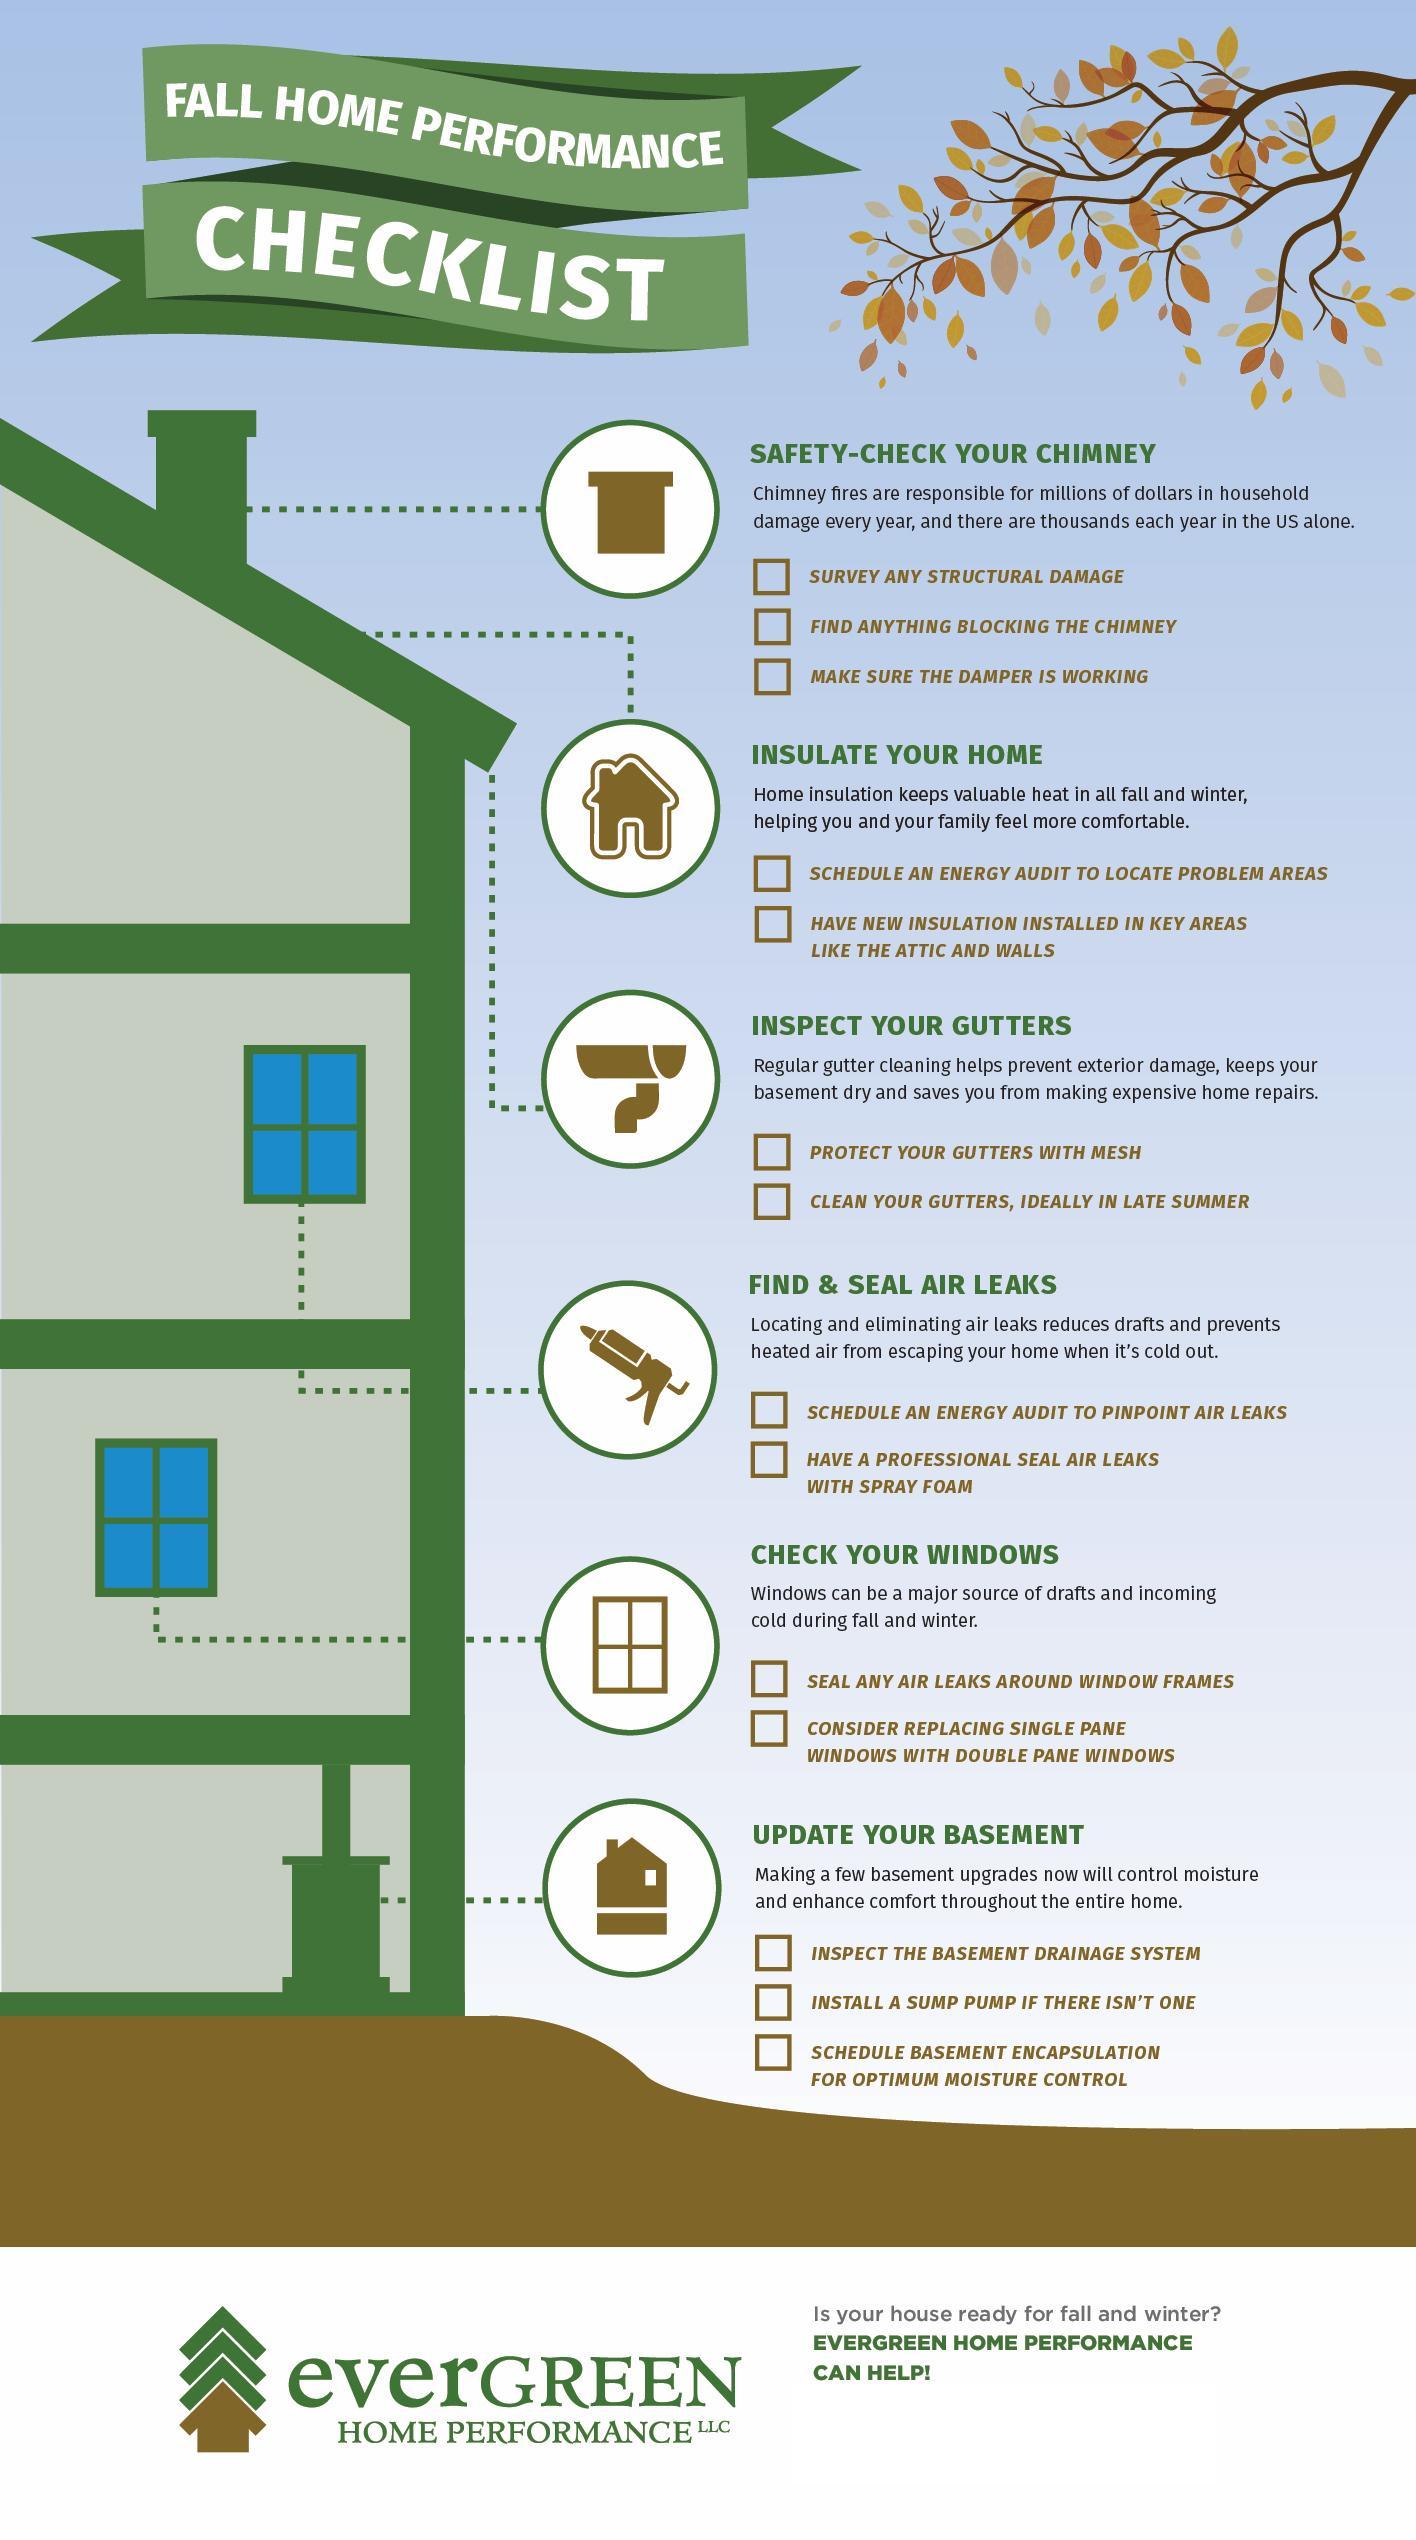 home performance, evergreen, maine, insulation, windows, air sealing